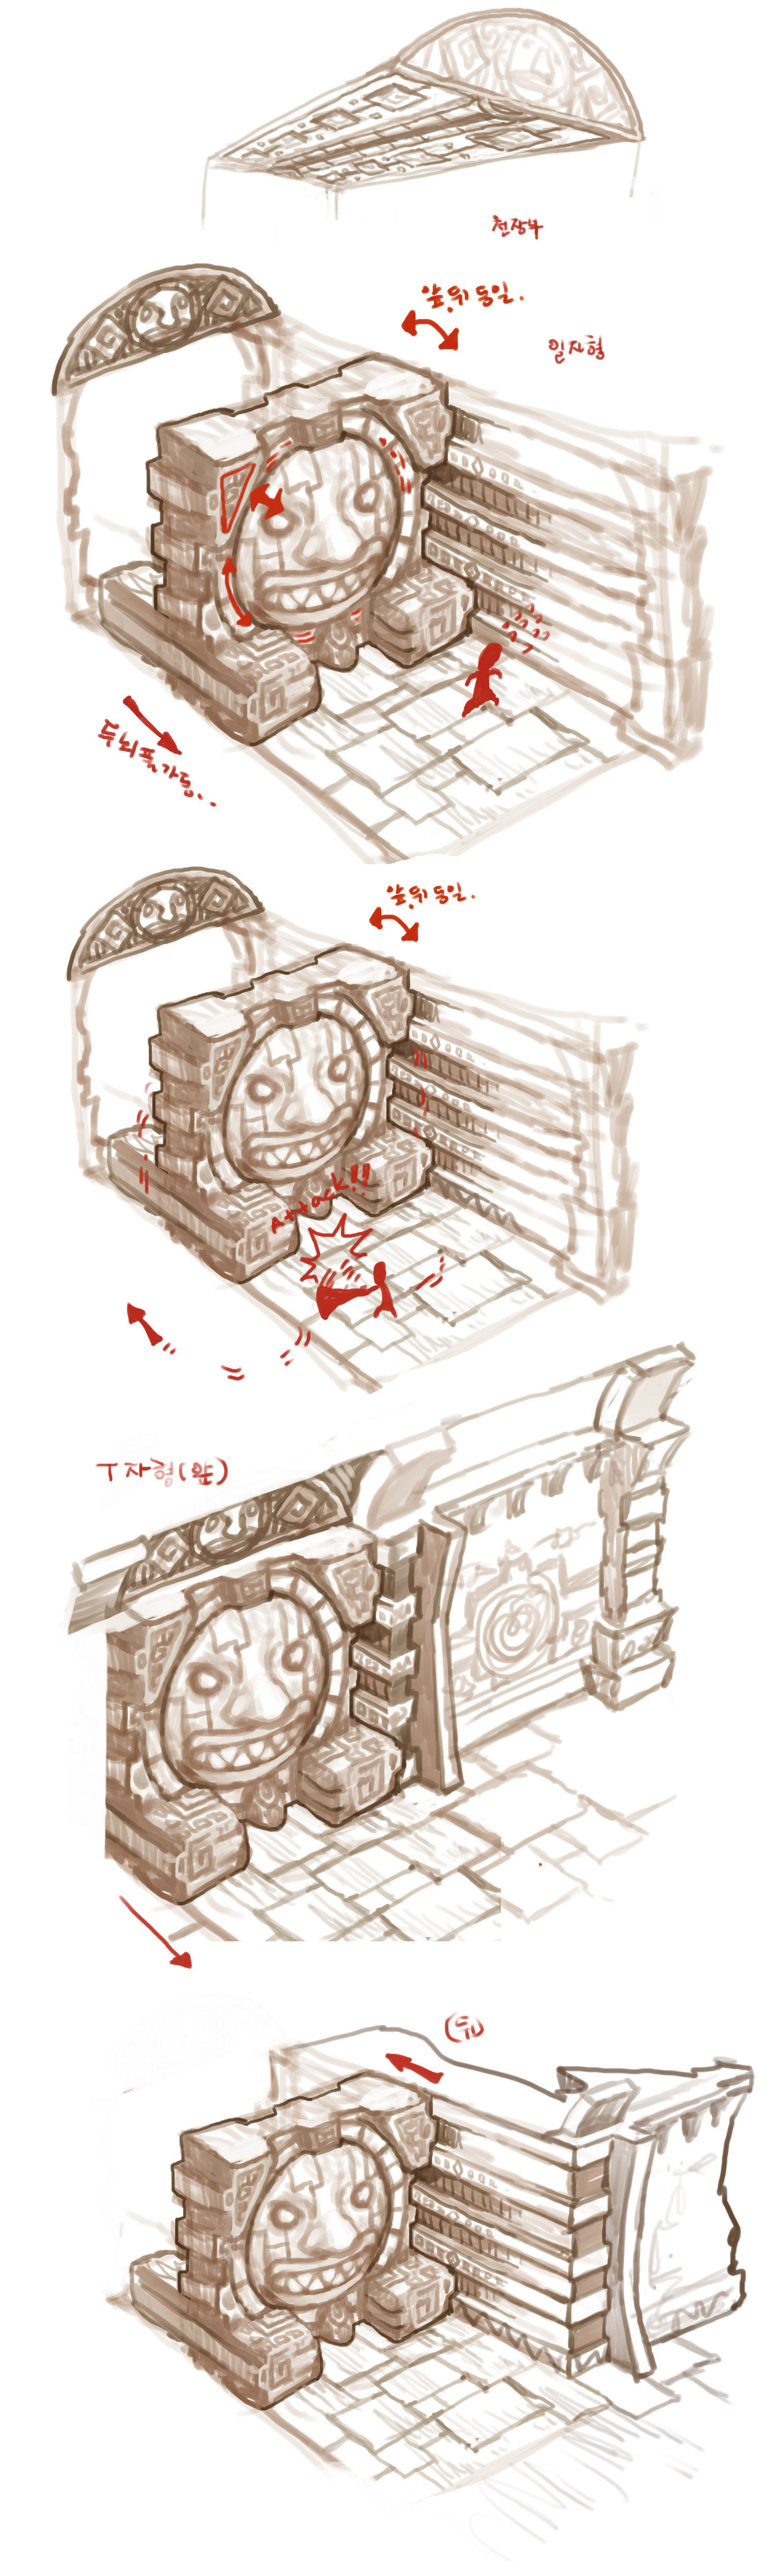 Seung chan lee bg ancient 9